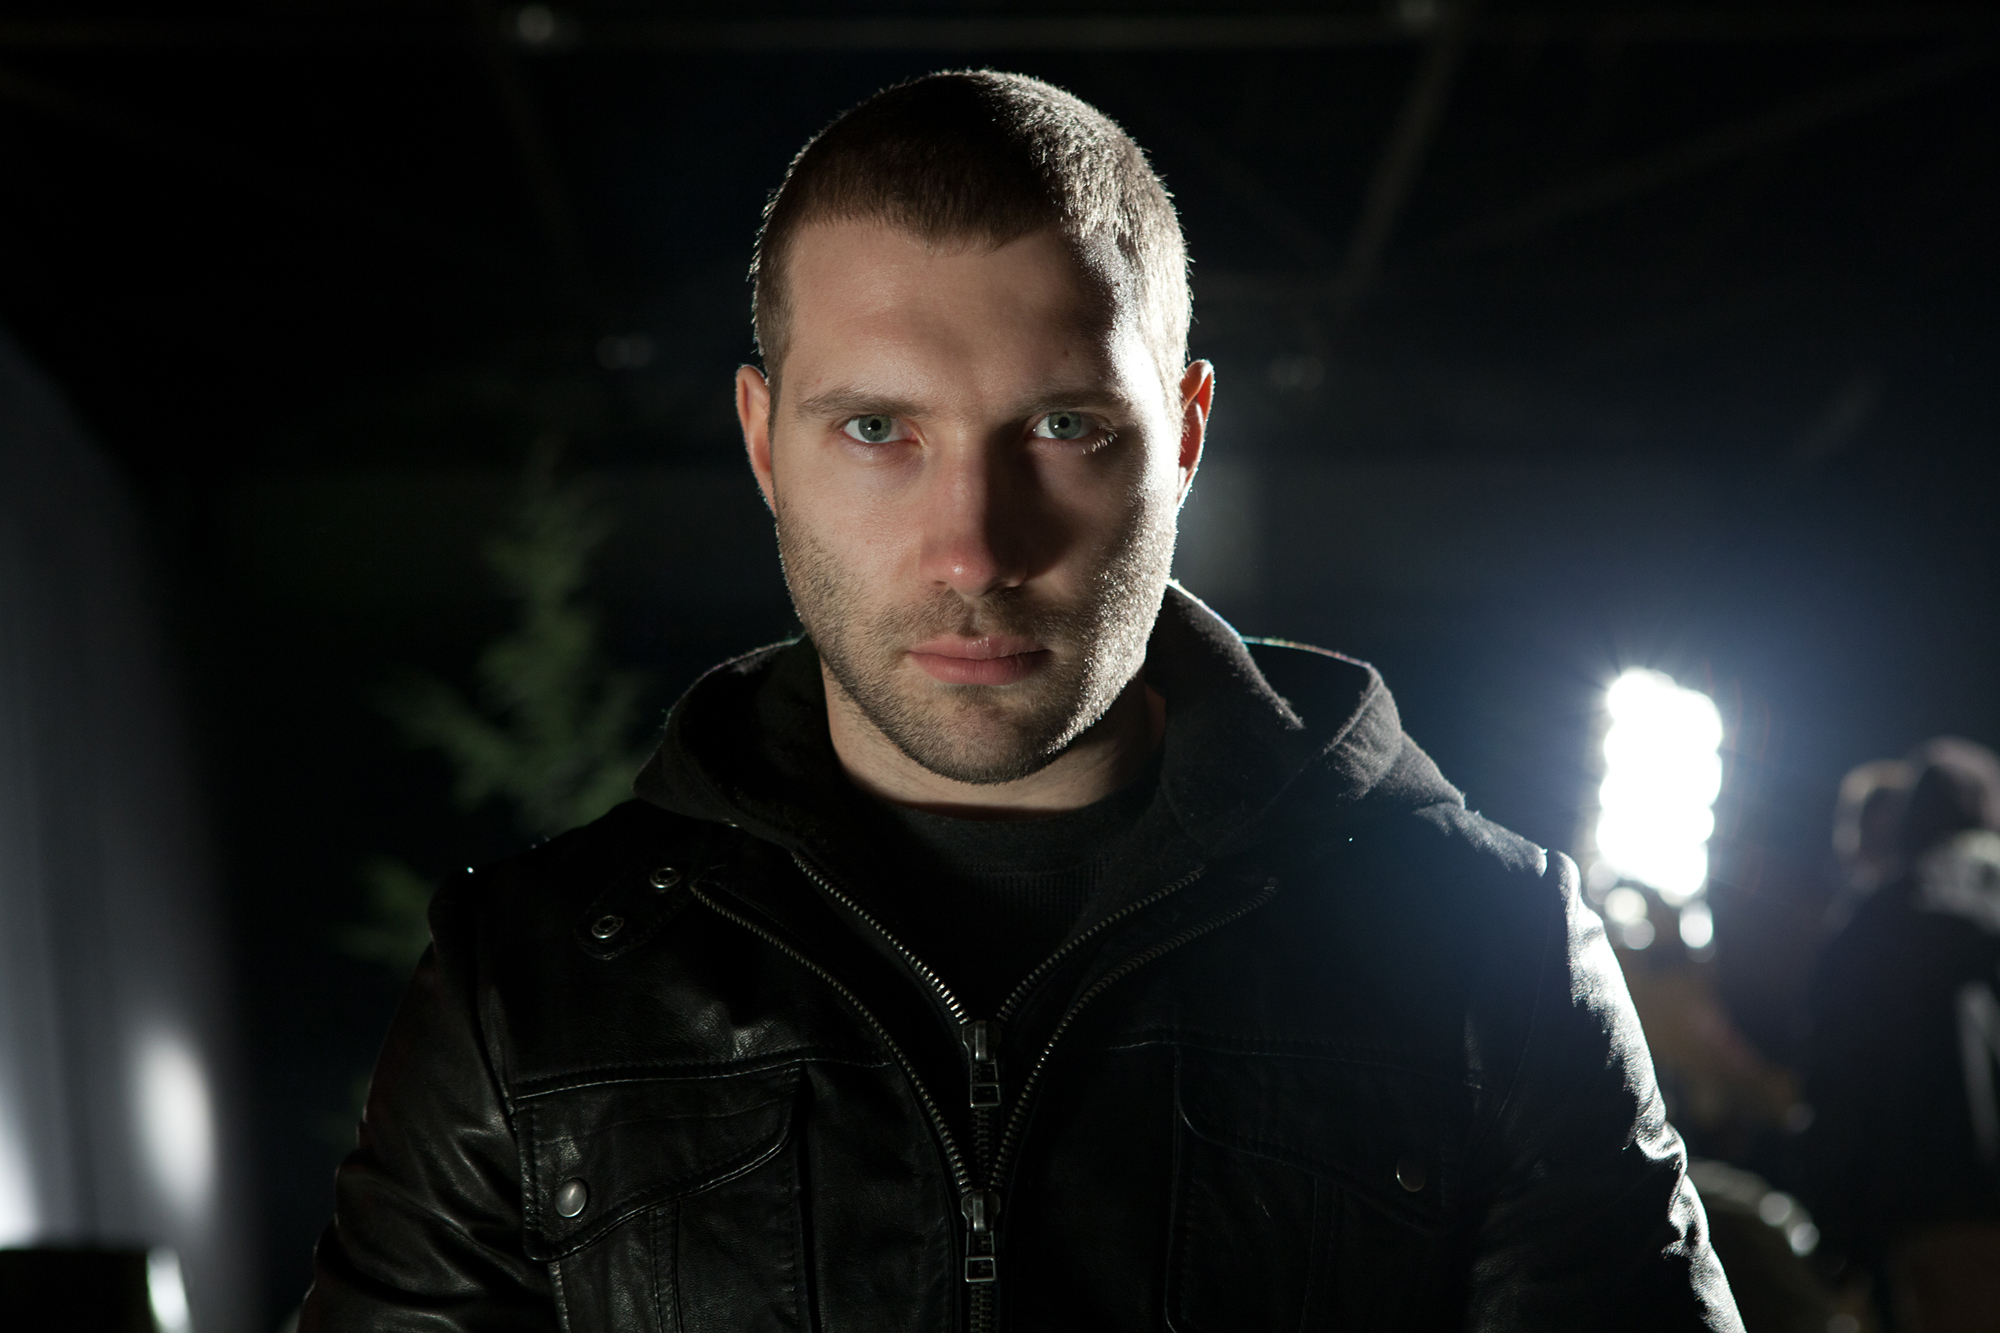 charlie jack reacher villains wiki fandom powered by wikia